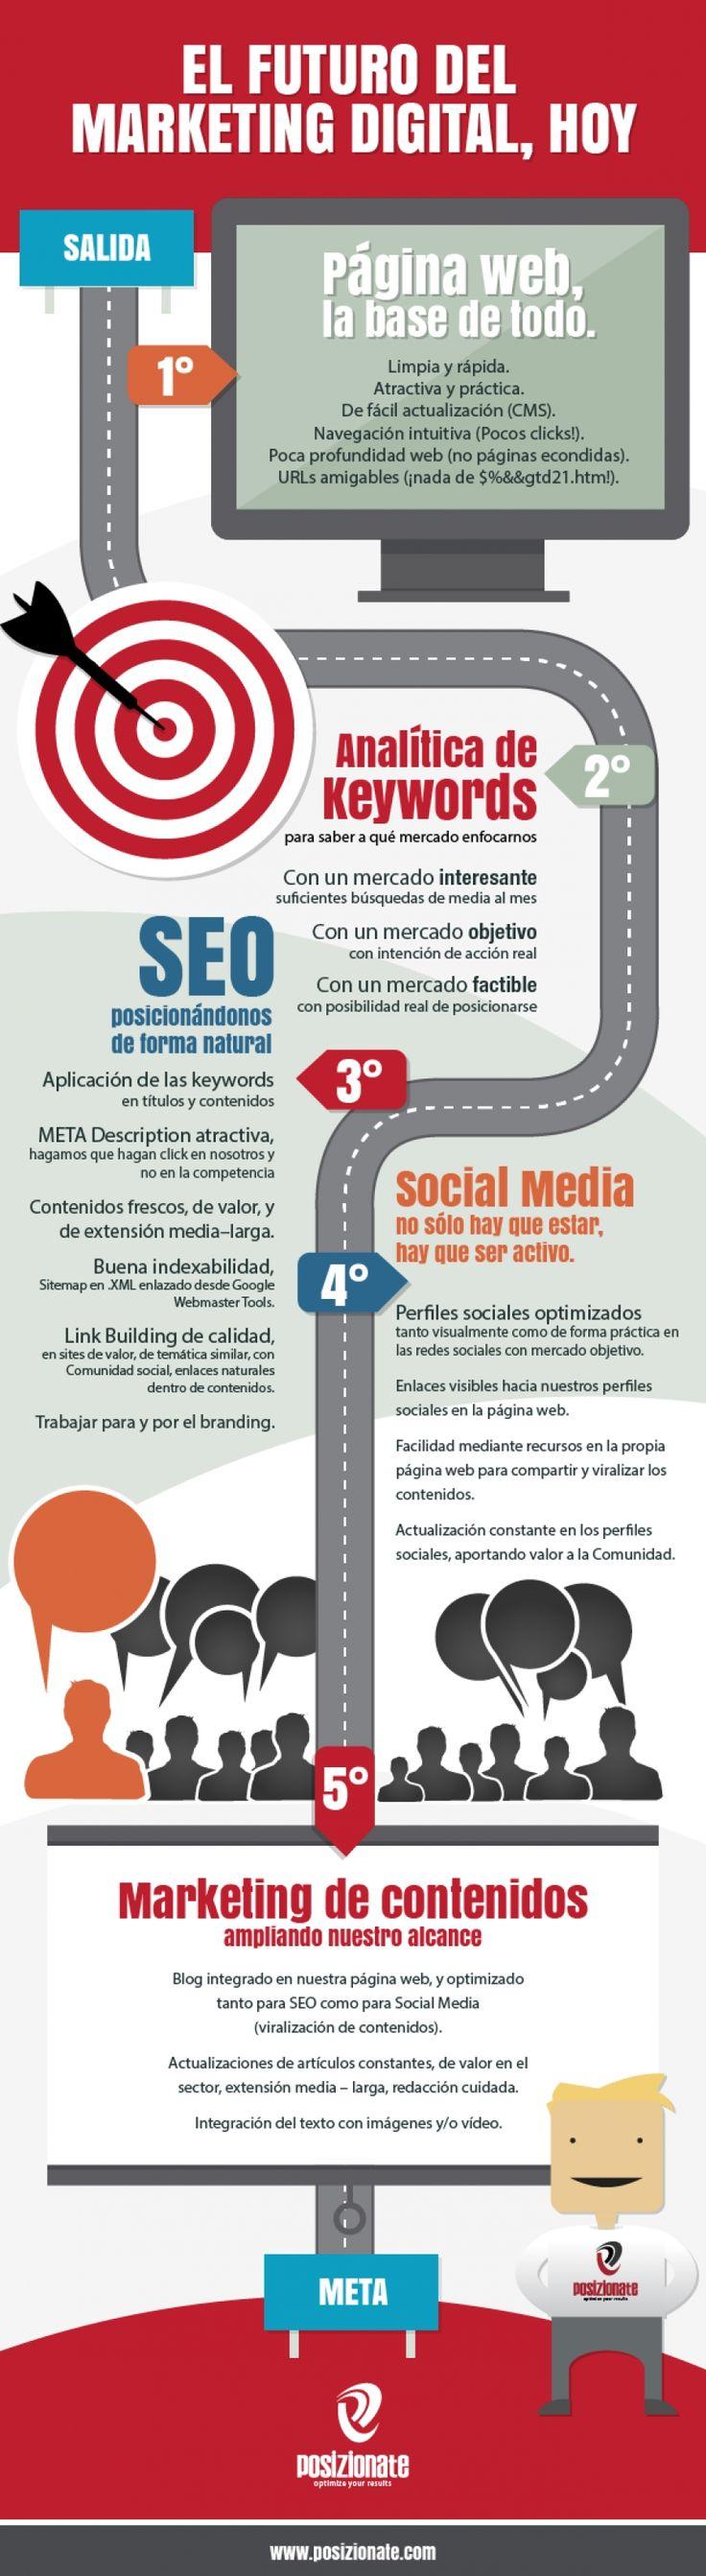 El futuro del marketing digital hoy #infografia #infographic #marketing